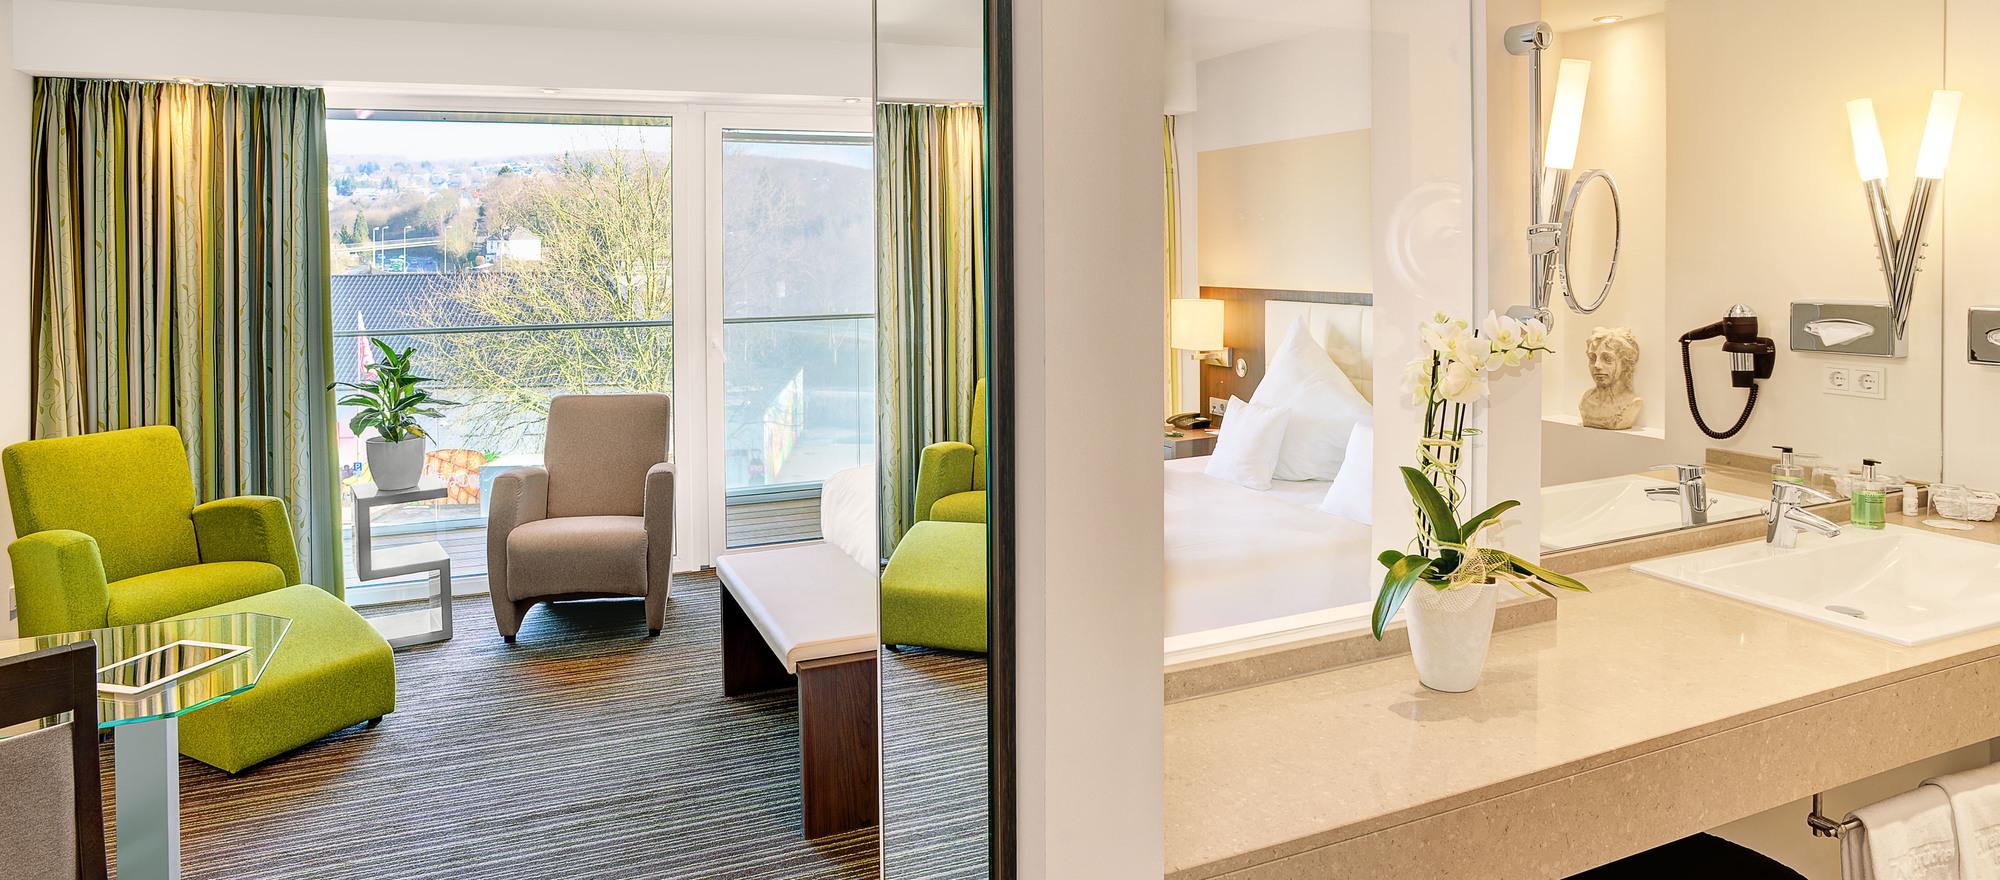 Ringhotel zweibr cker hof in herdecke nordrhein westfalen for Moderne hotels nrw